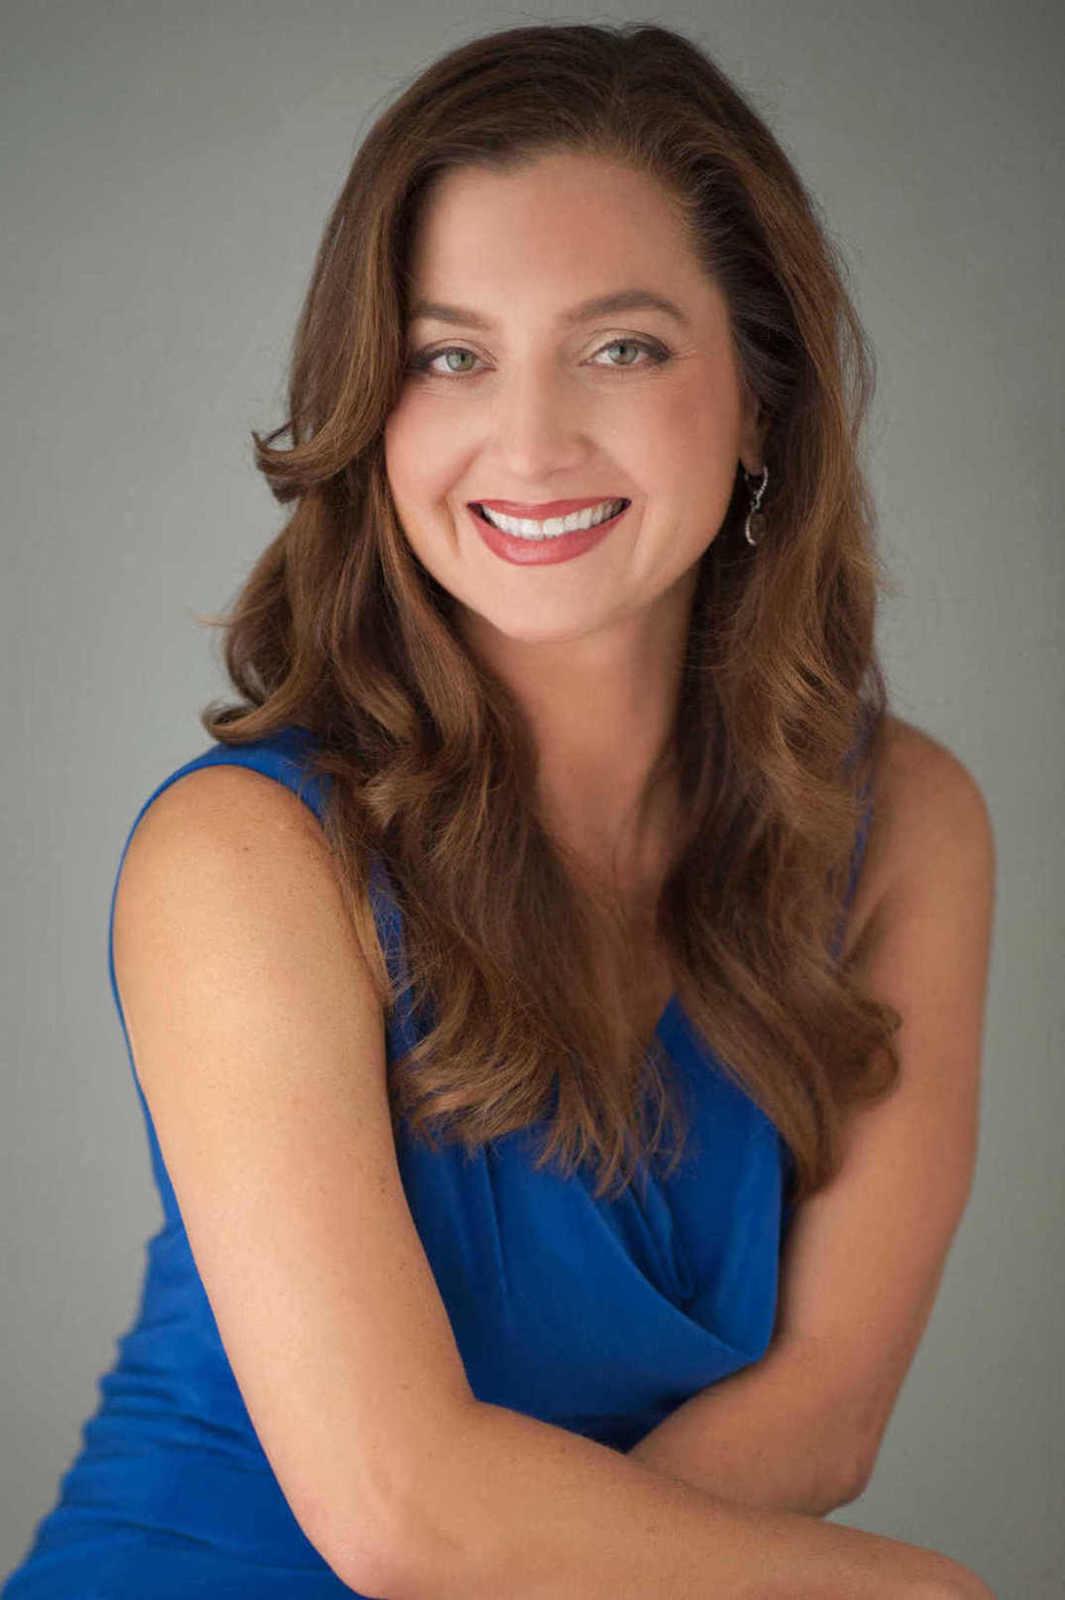 Angela Melvin, Founder & CEO, Valerie's House